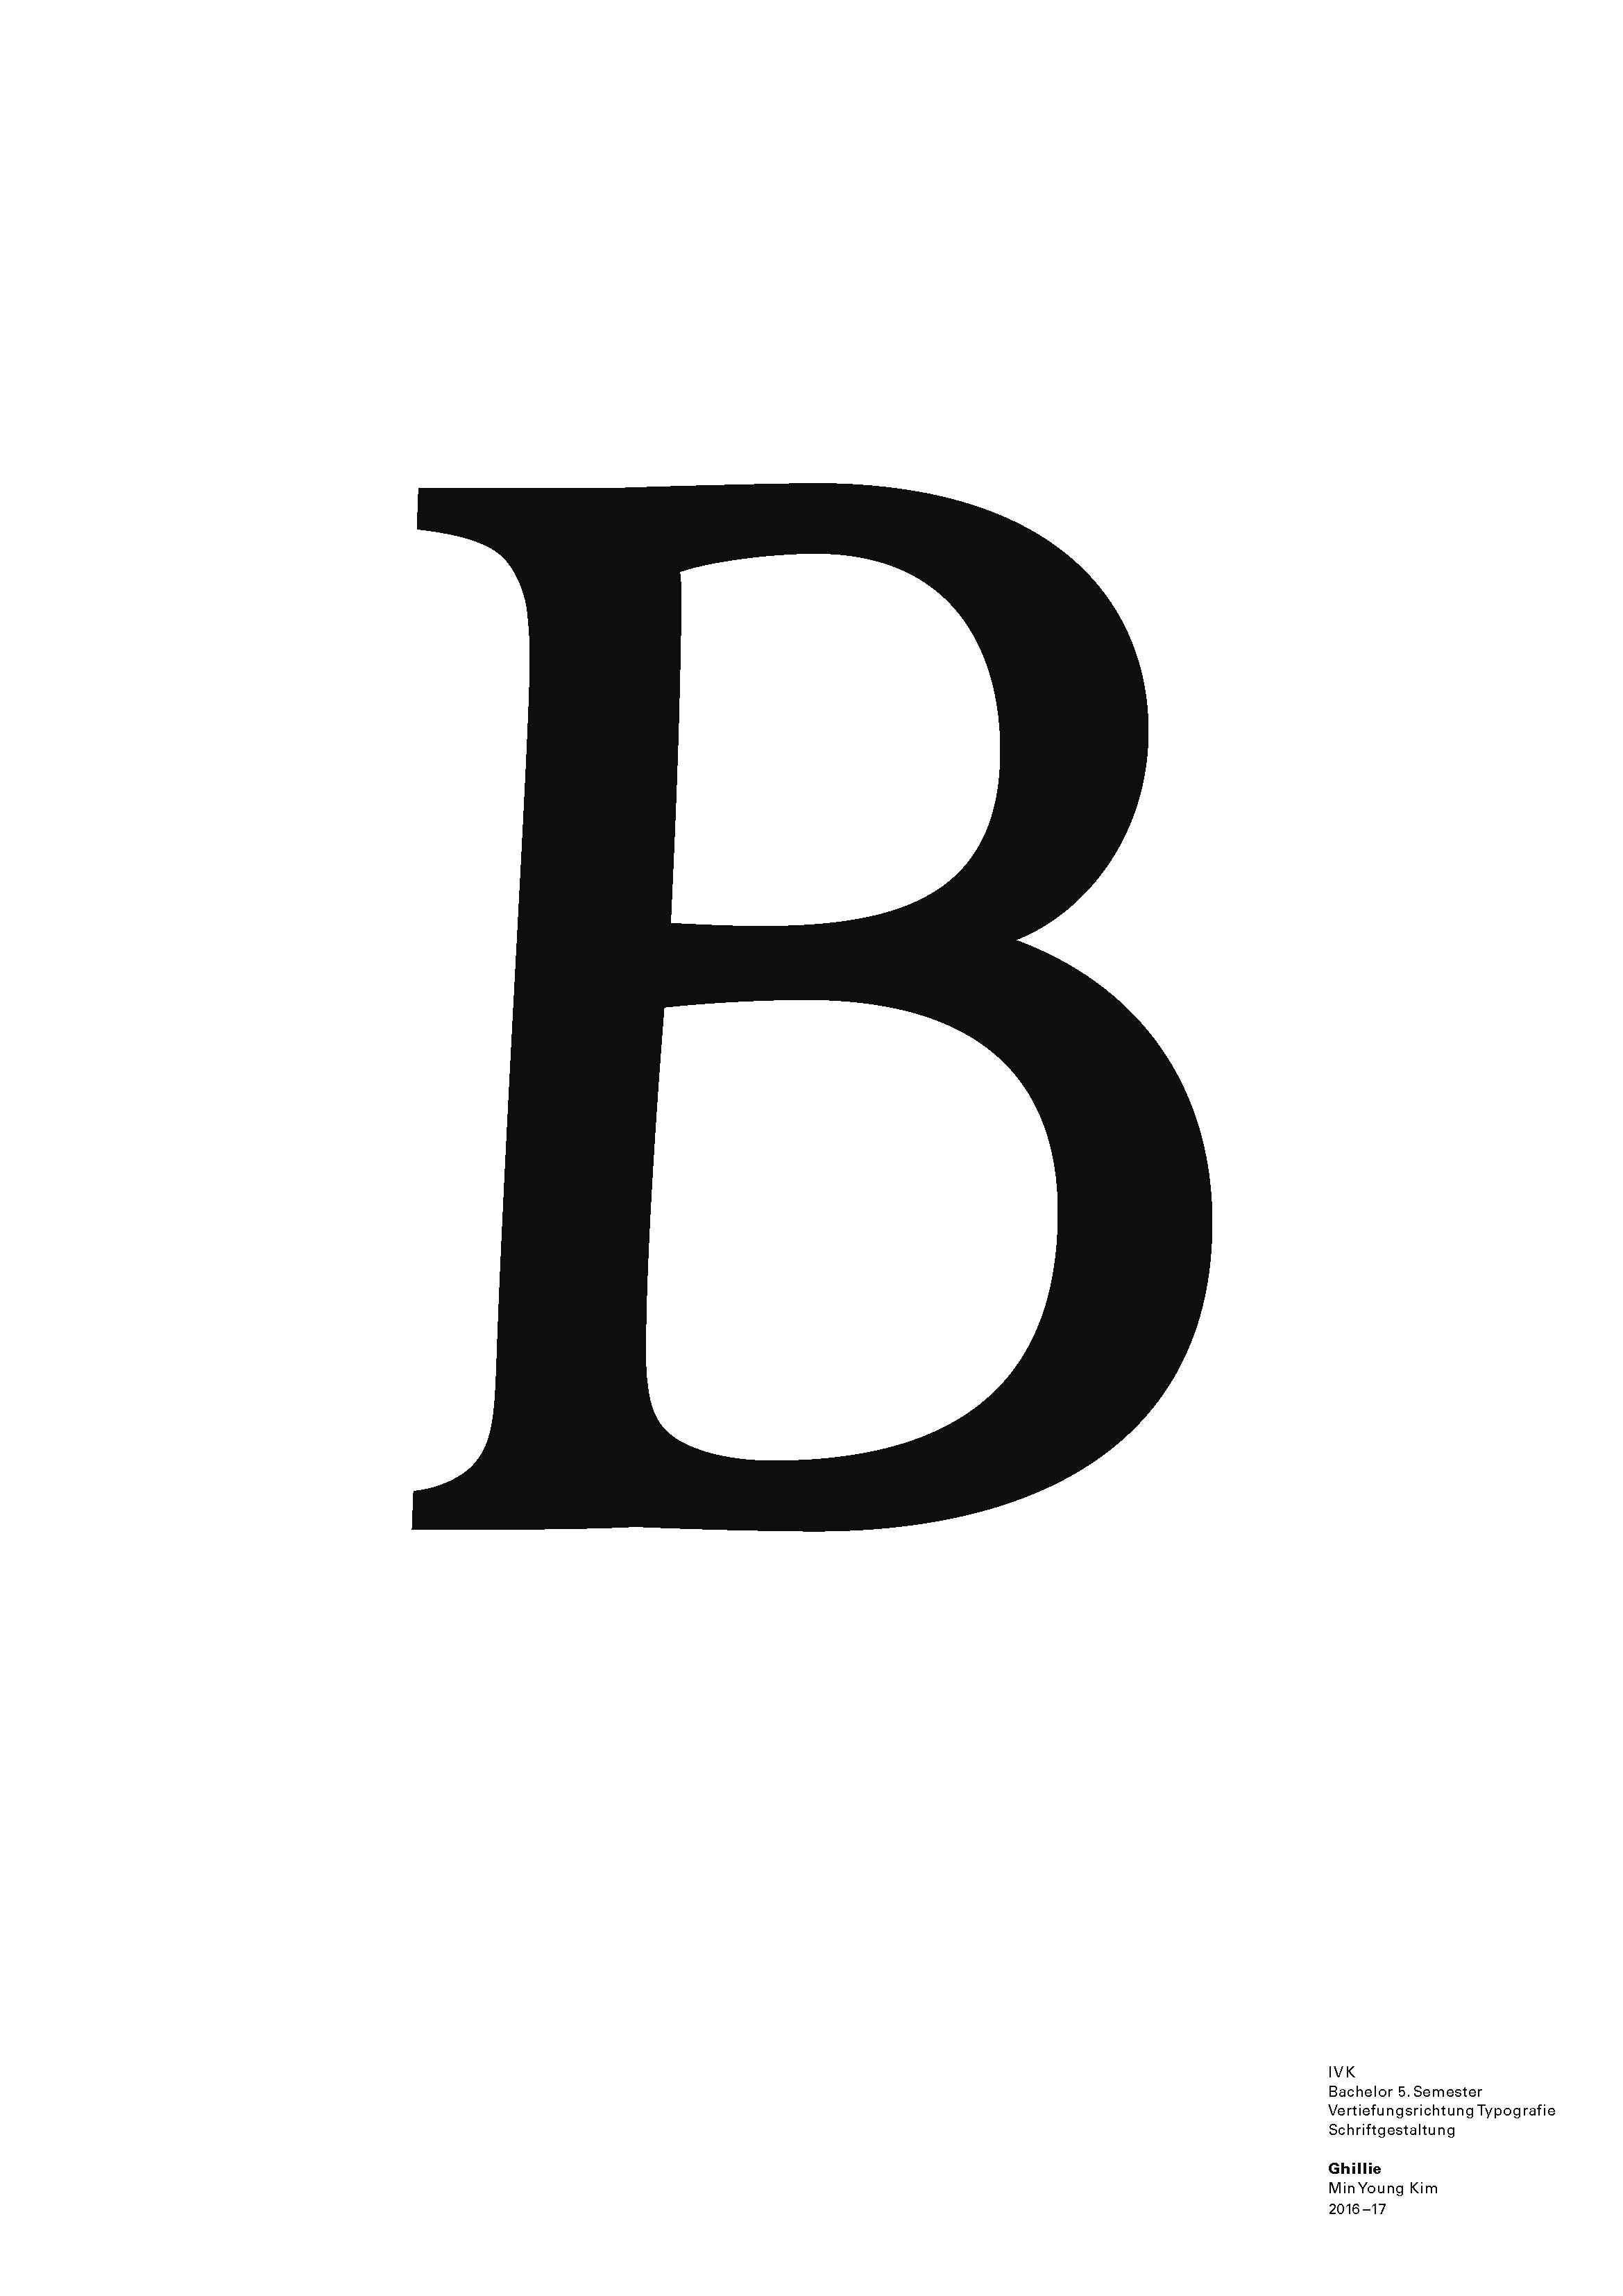 5_buchstaben_페이지_2.jpg